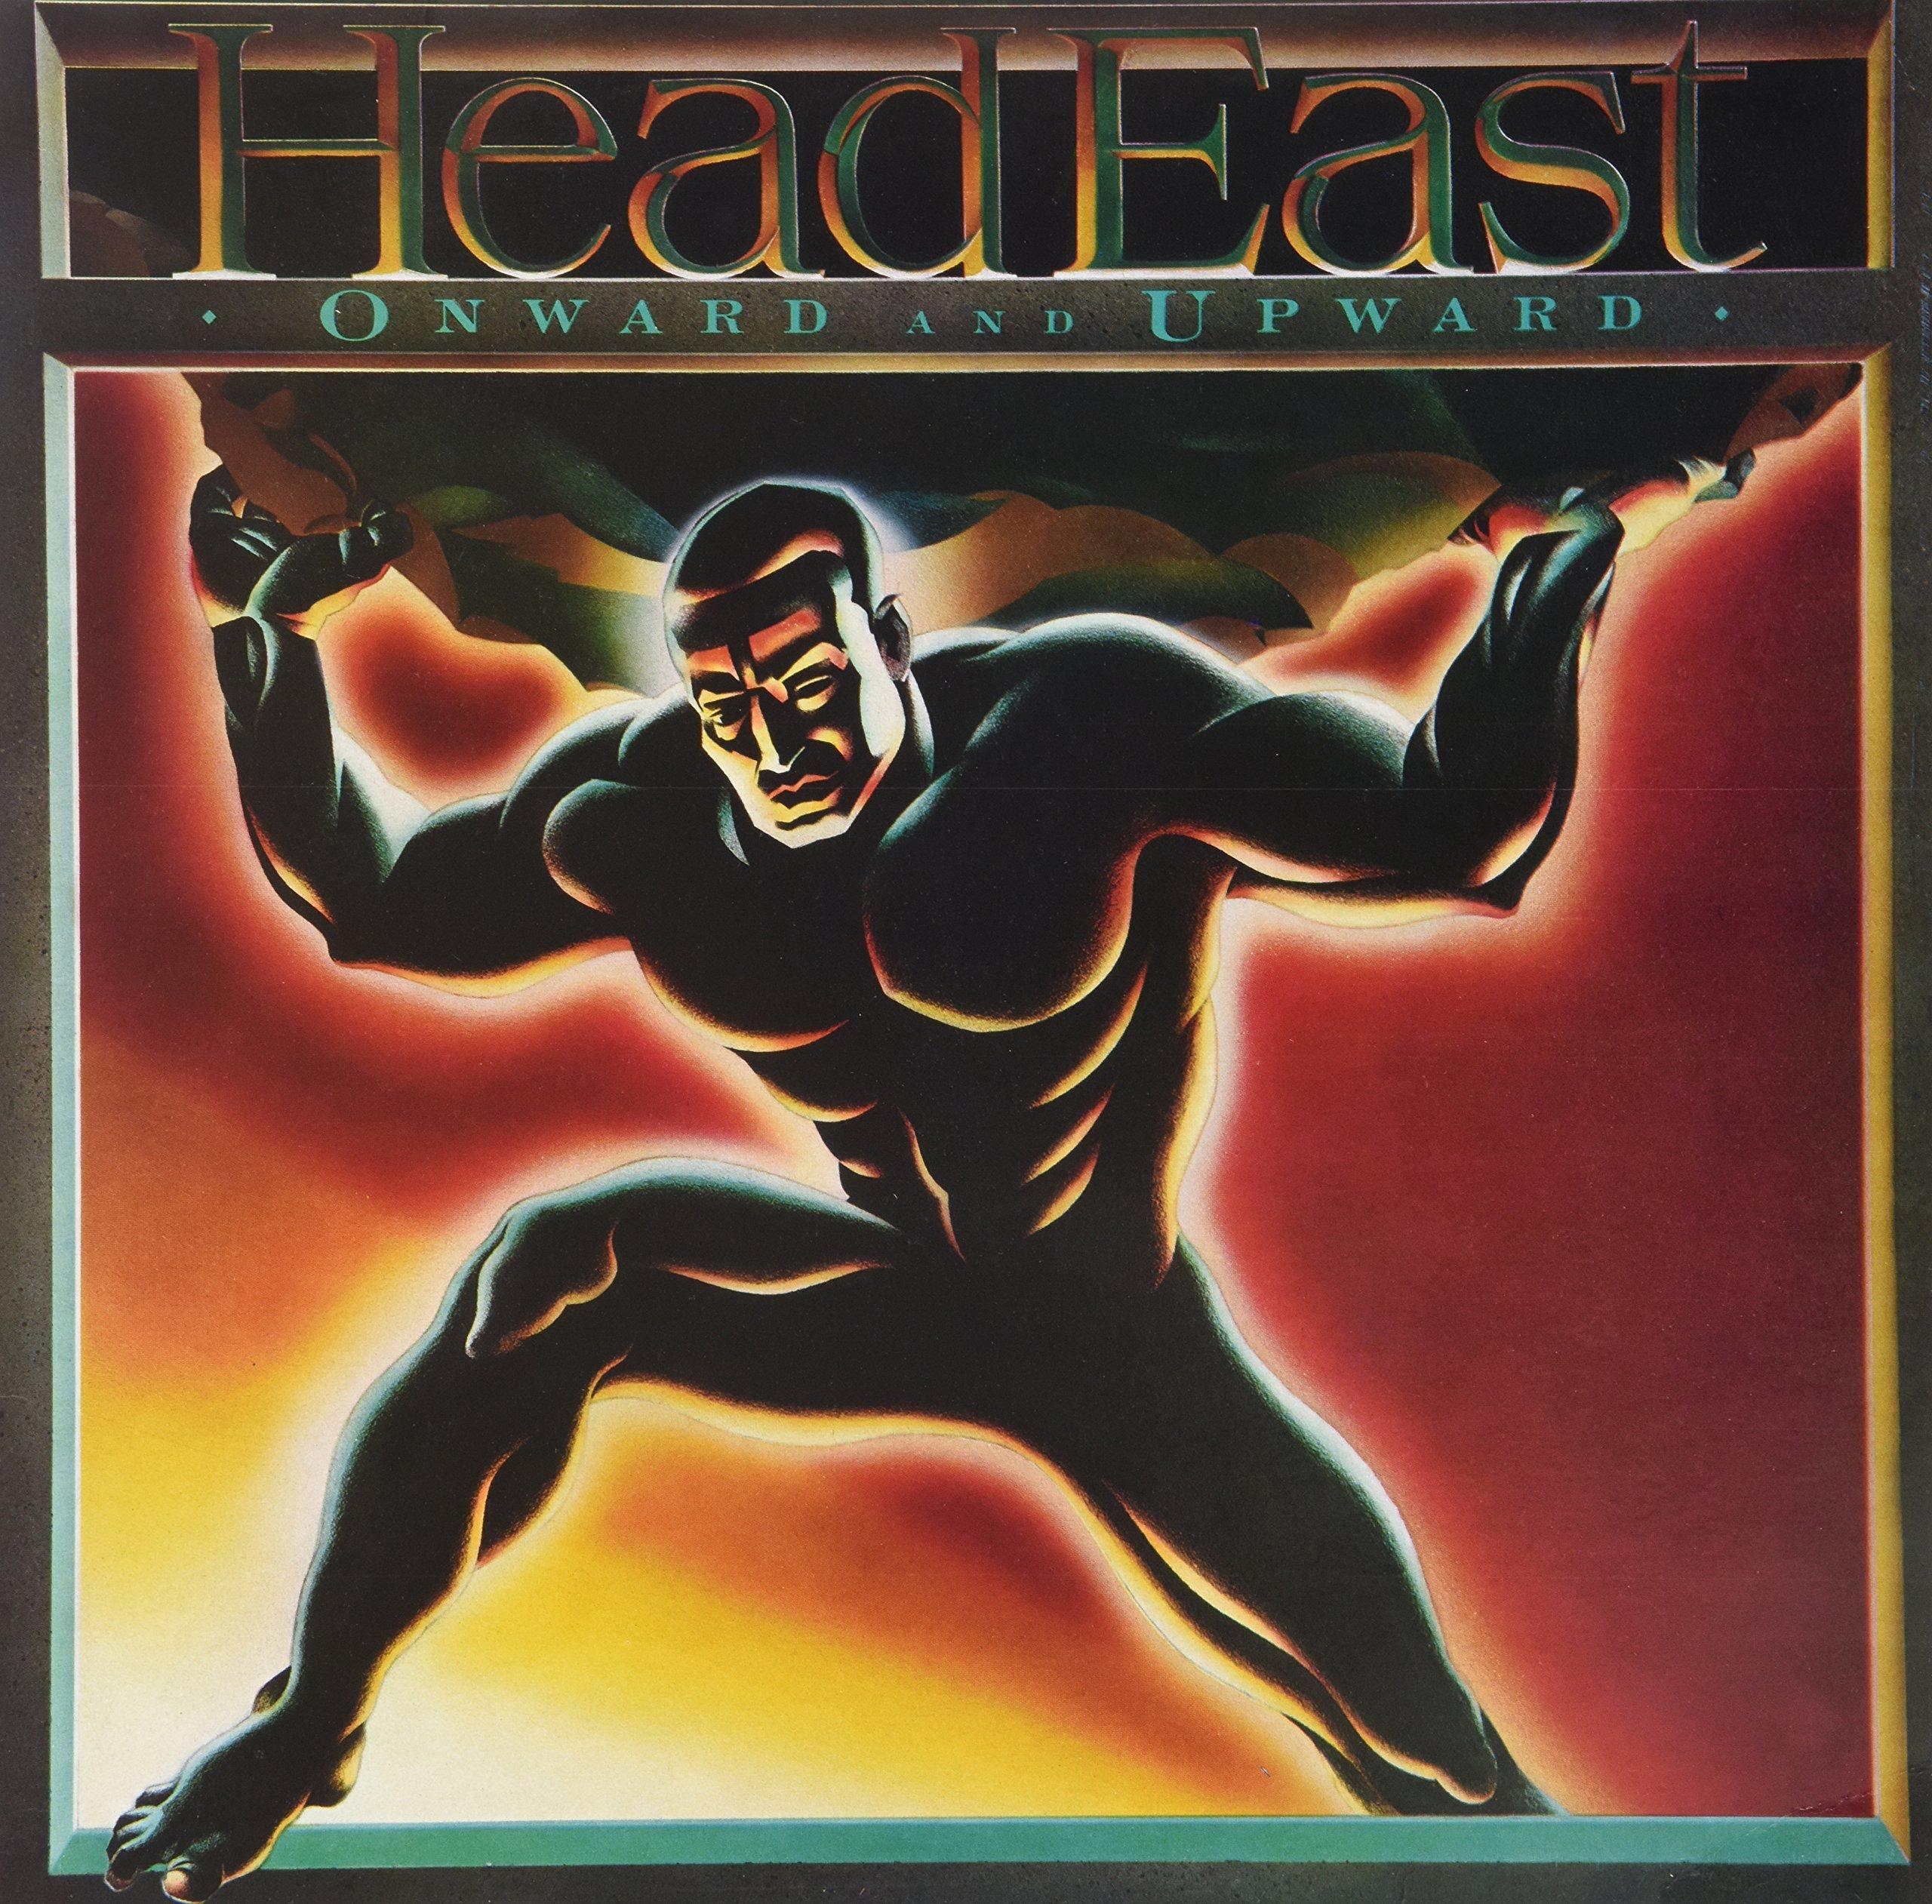 Vinilo : Head East - Onward And Upward (LP Vinyl)